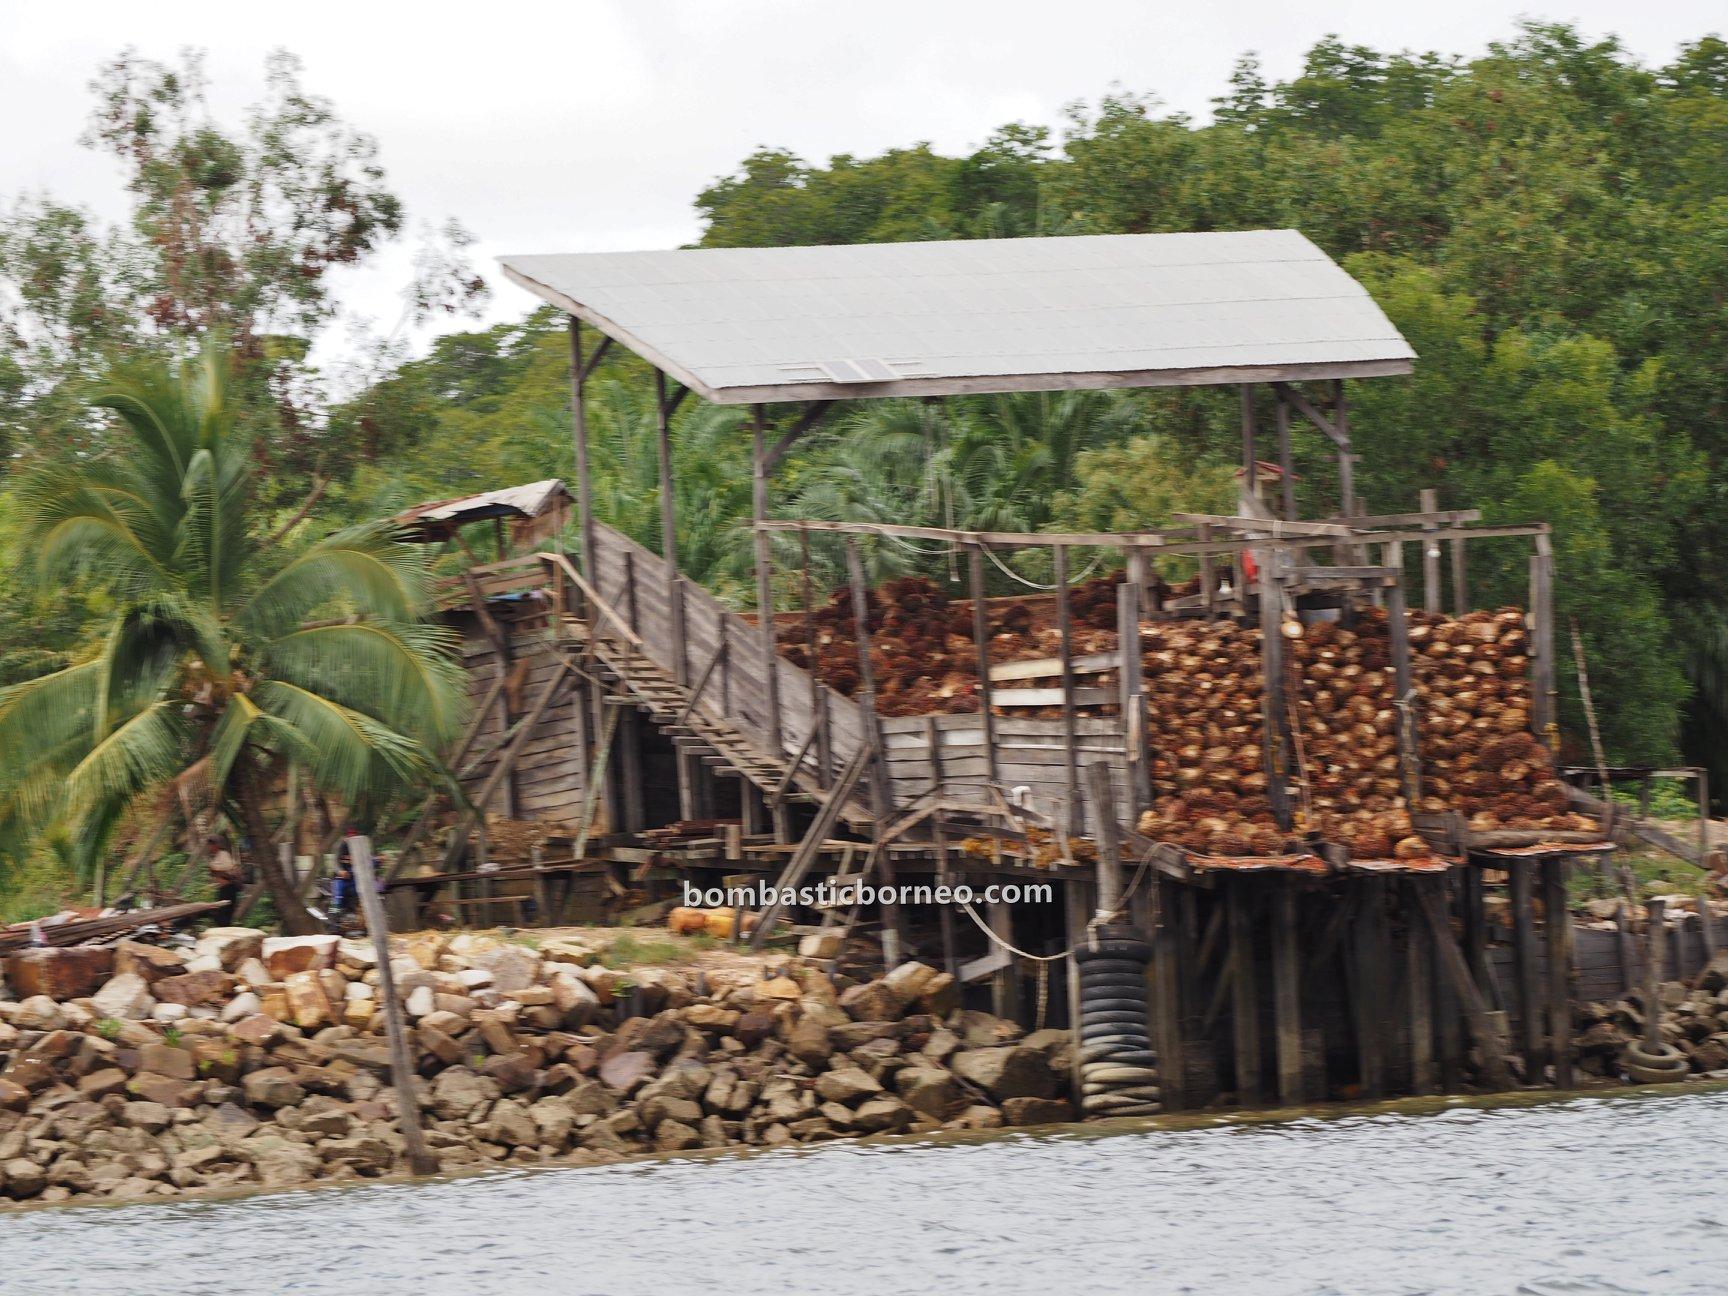 Island, jelajah, exploration, Tawau, tourism, Borneo,